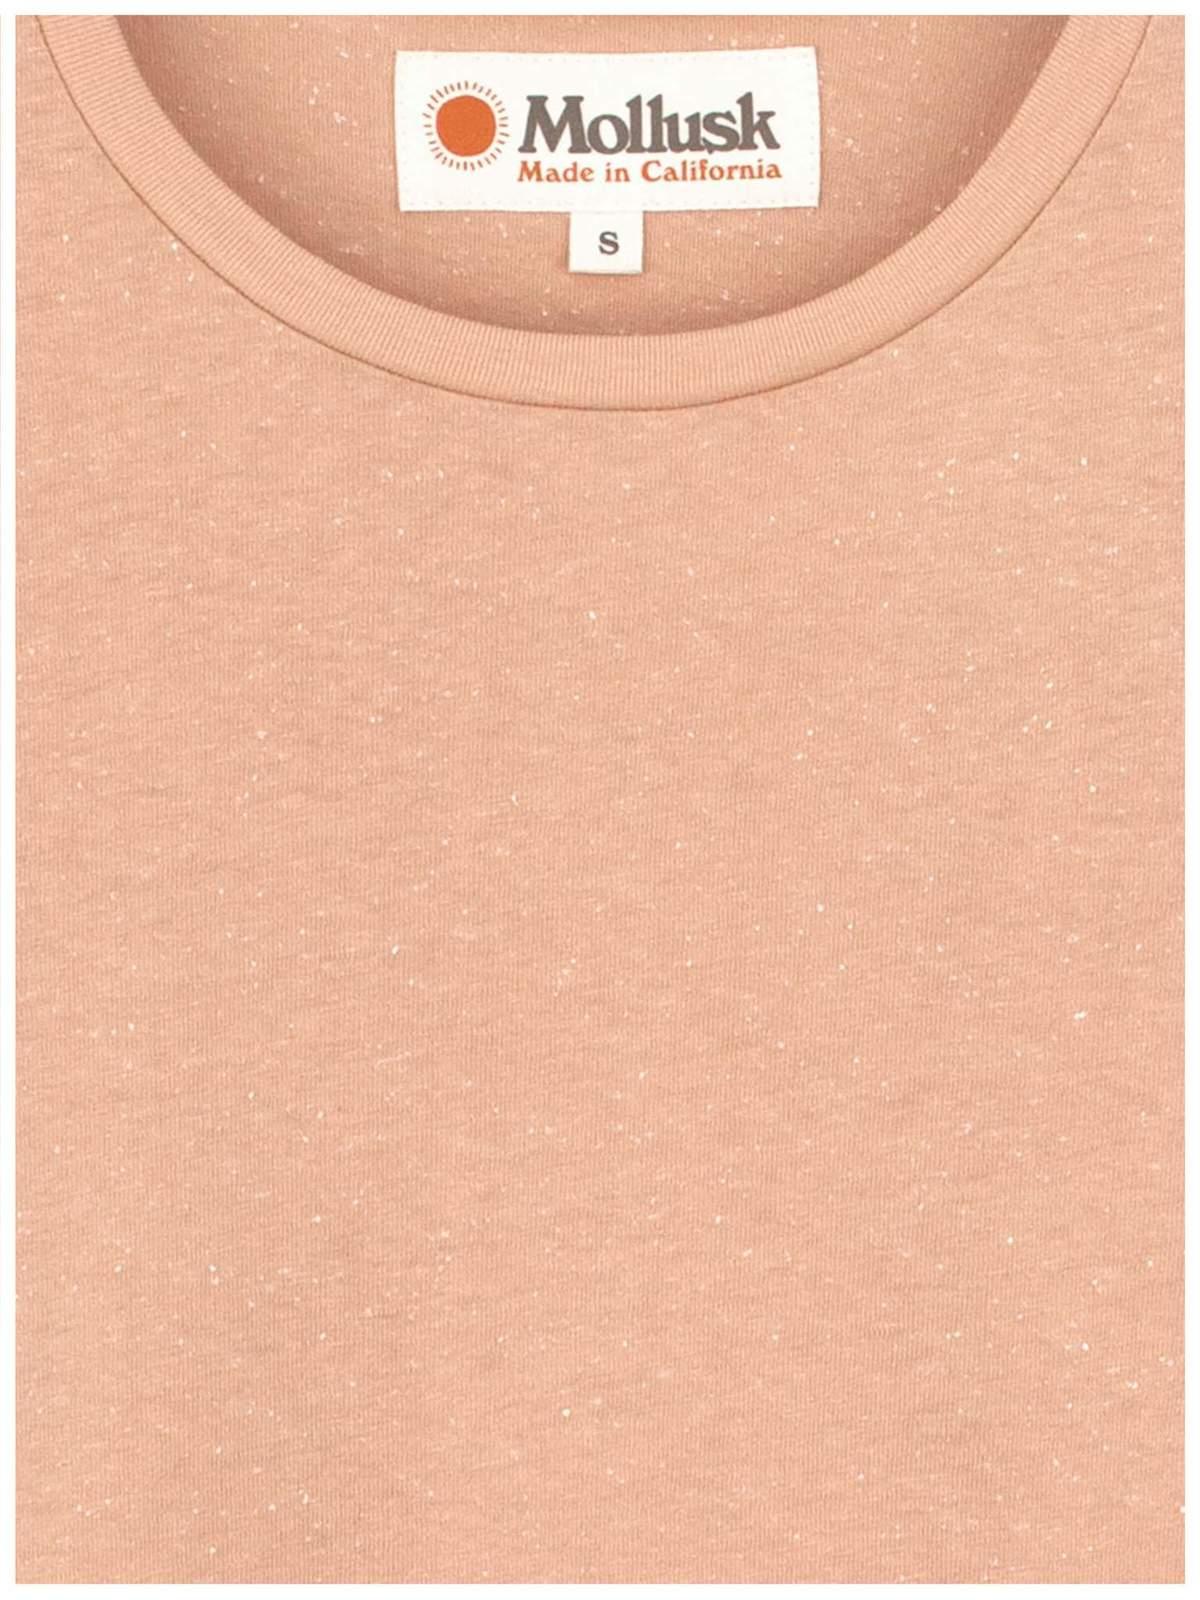 8e77e7132ab7 Mollusk Half Sleeve Hemp Tee - Blush | Garmentory